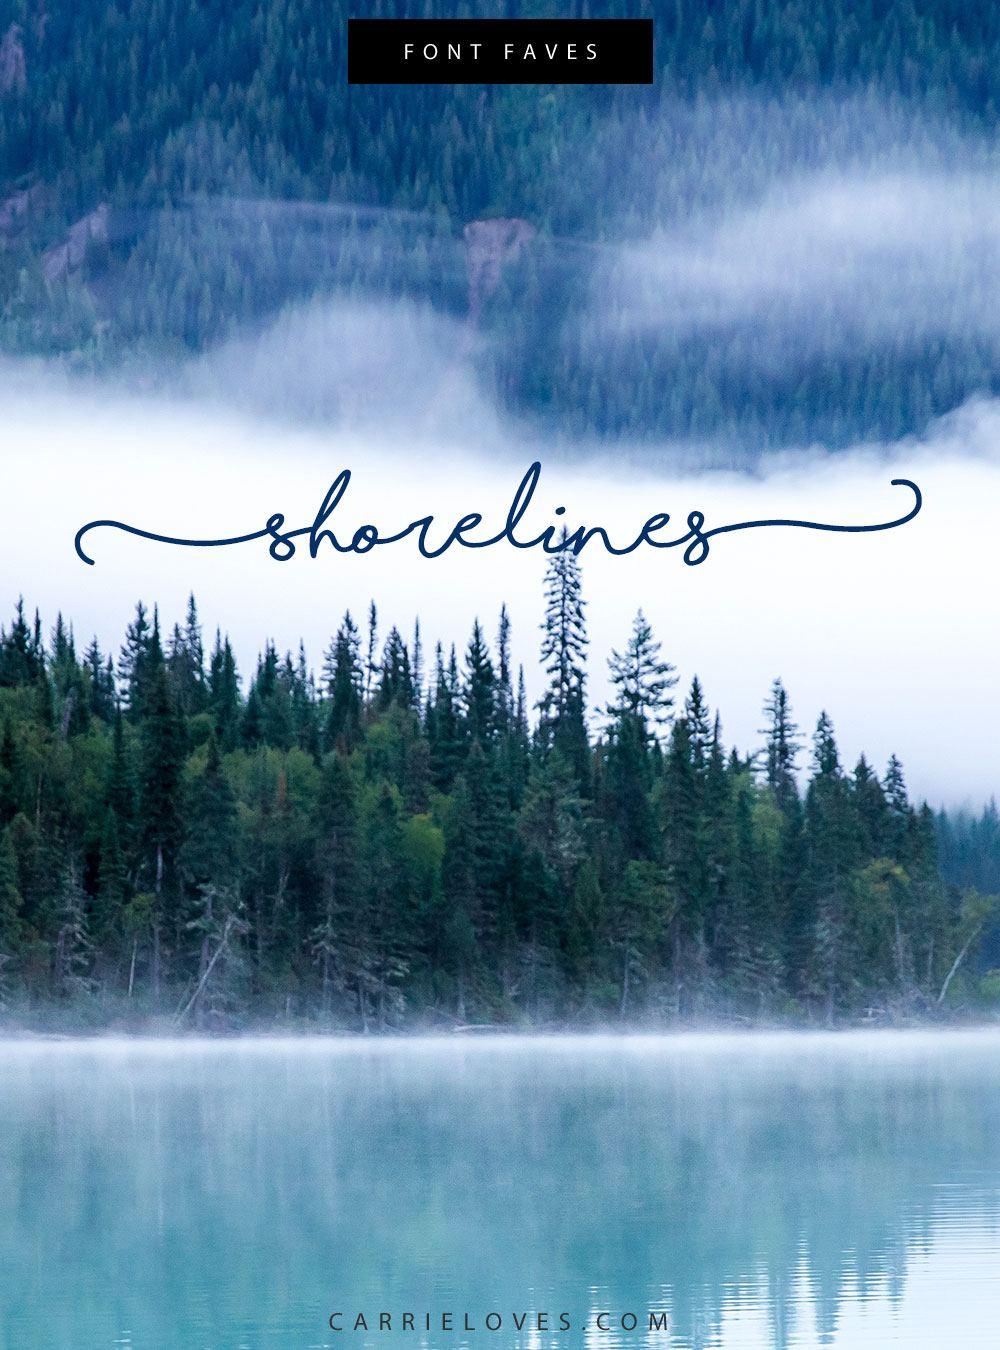 Font Faves Shorelines - Carrie Loves Blog